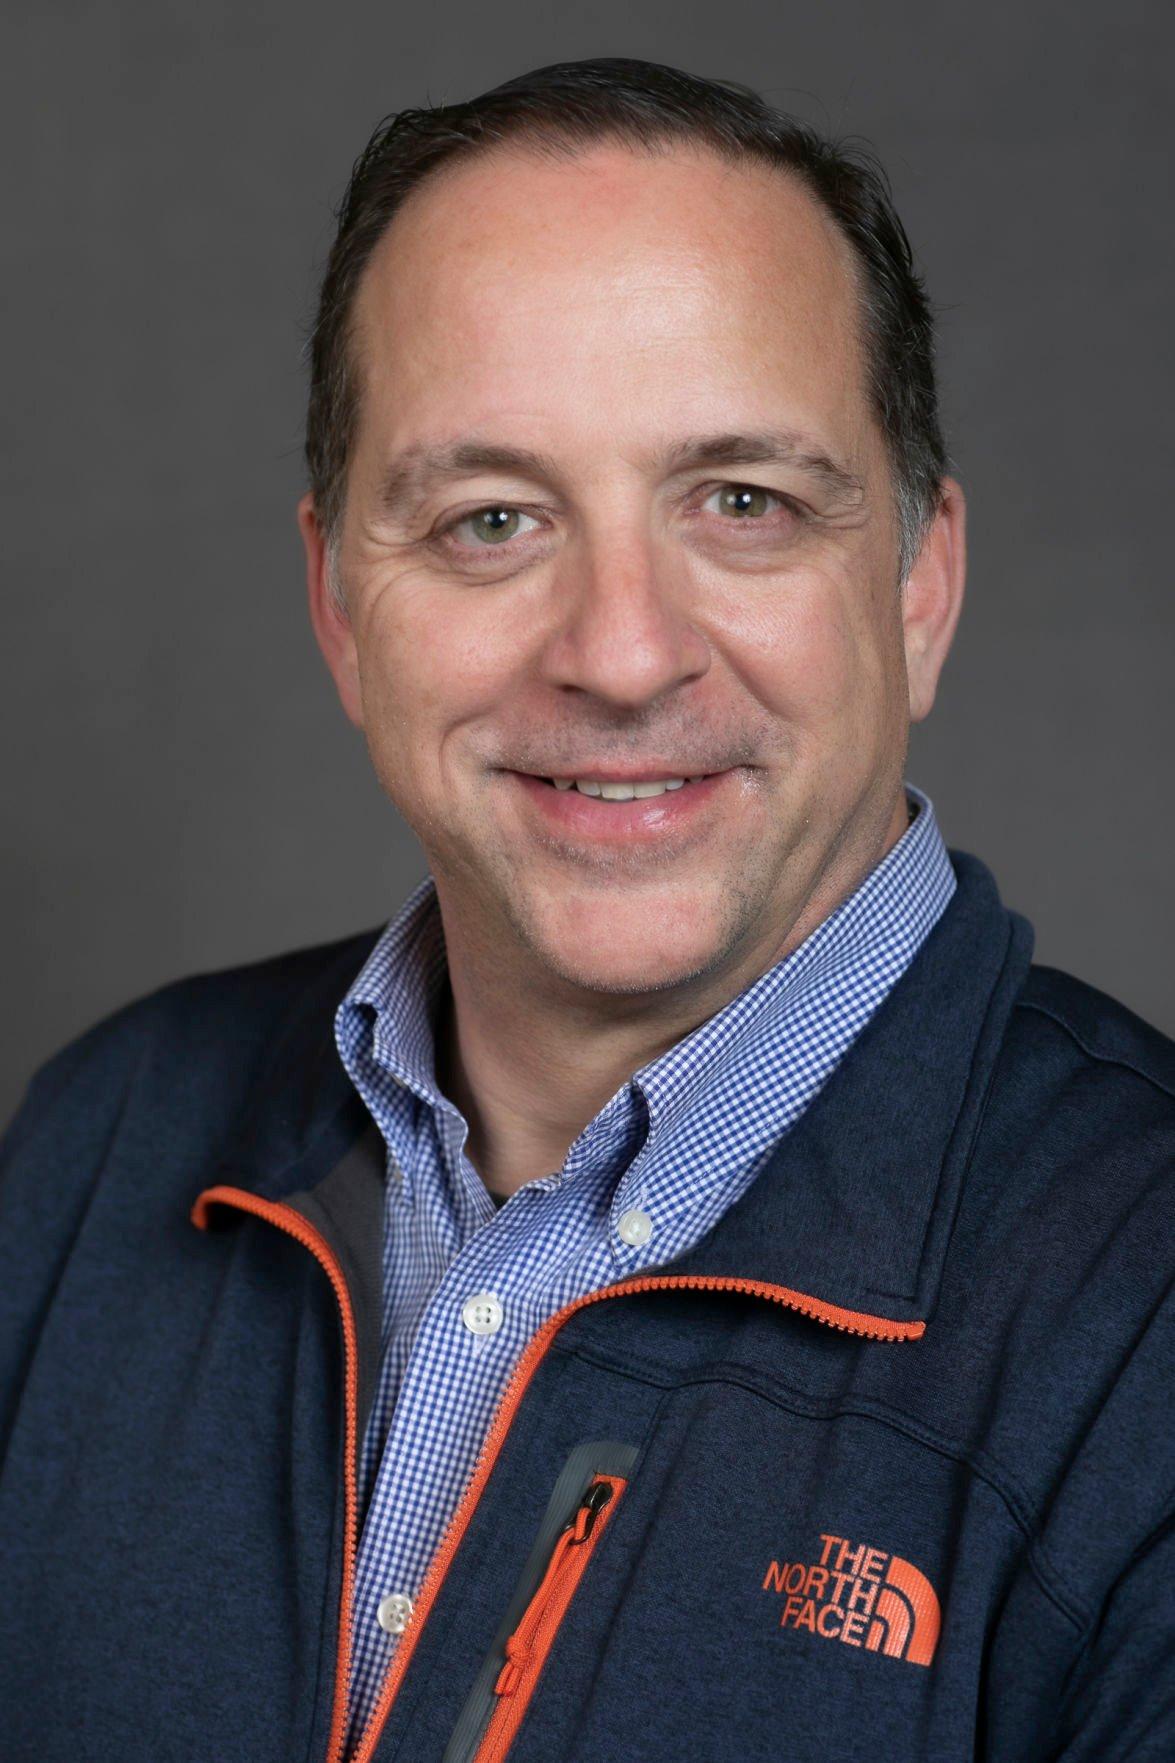 Todd Cotta